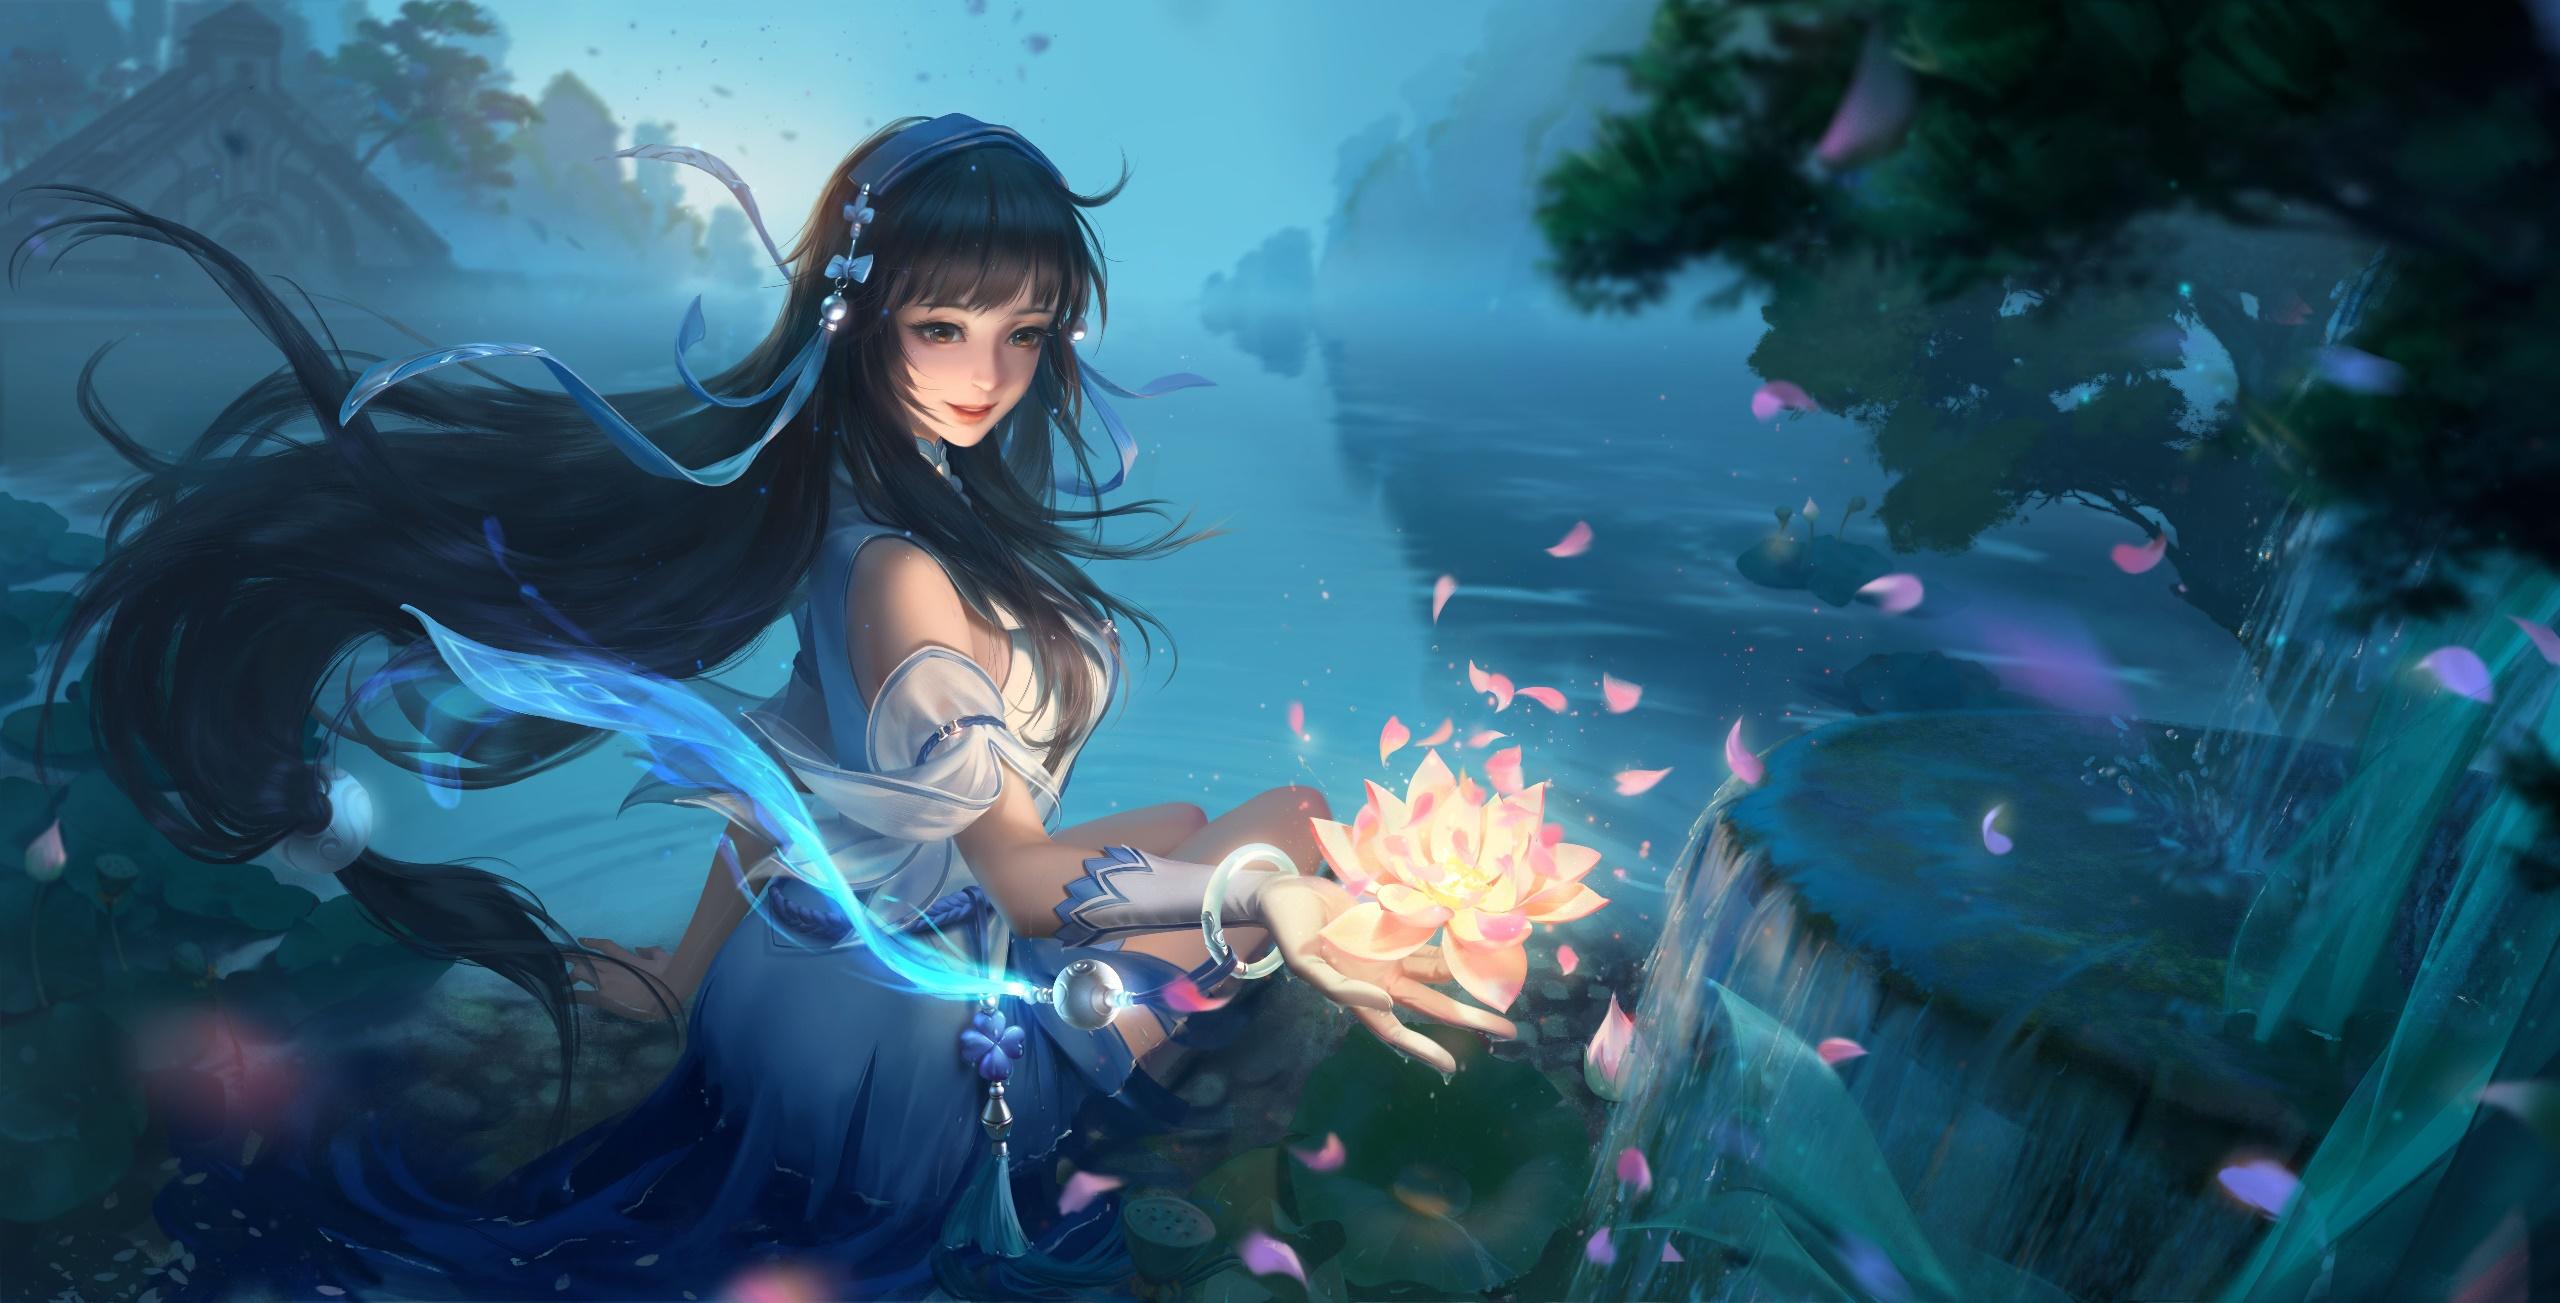 Anime 2560x1303 anime anime girls fantasy art fantasy girl long hair nature dark hair flowers Xi Shi Chinese character Chinese clothing